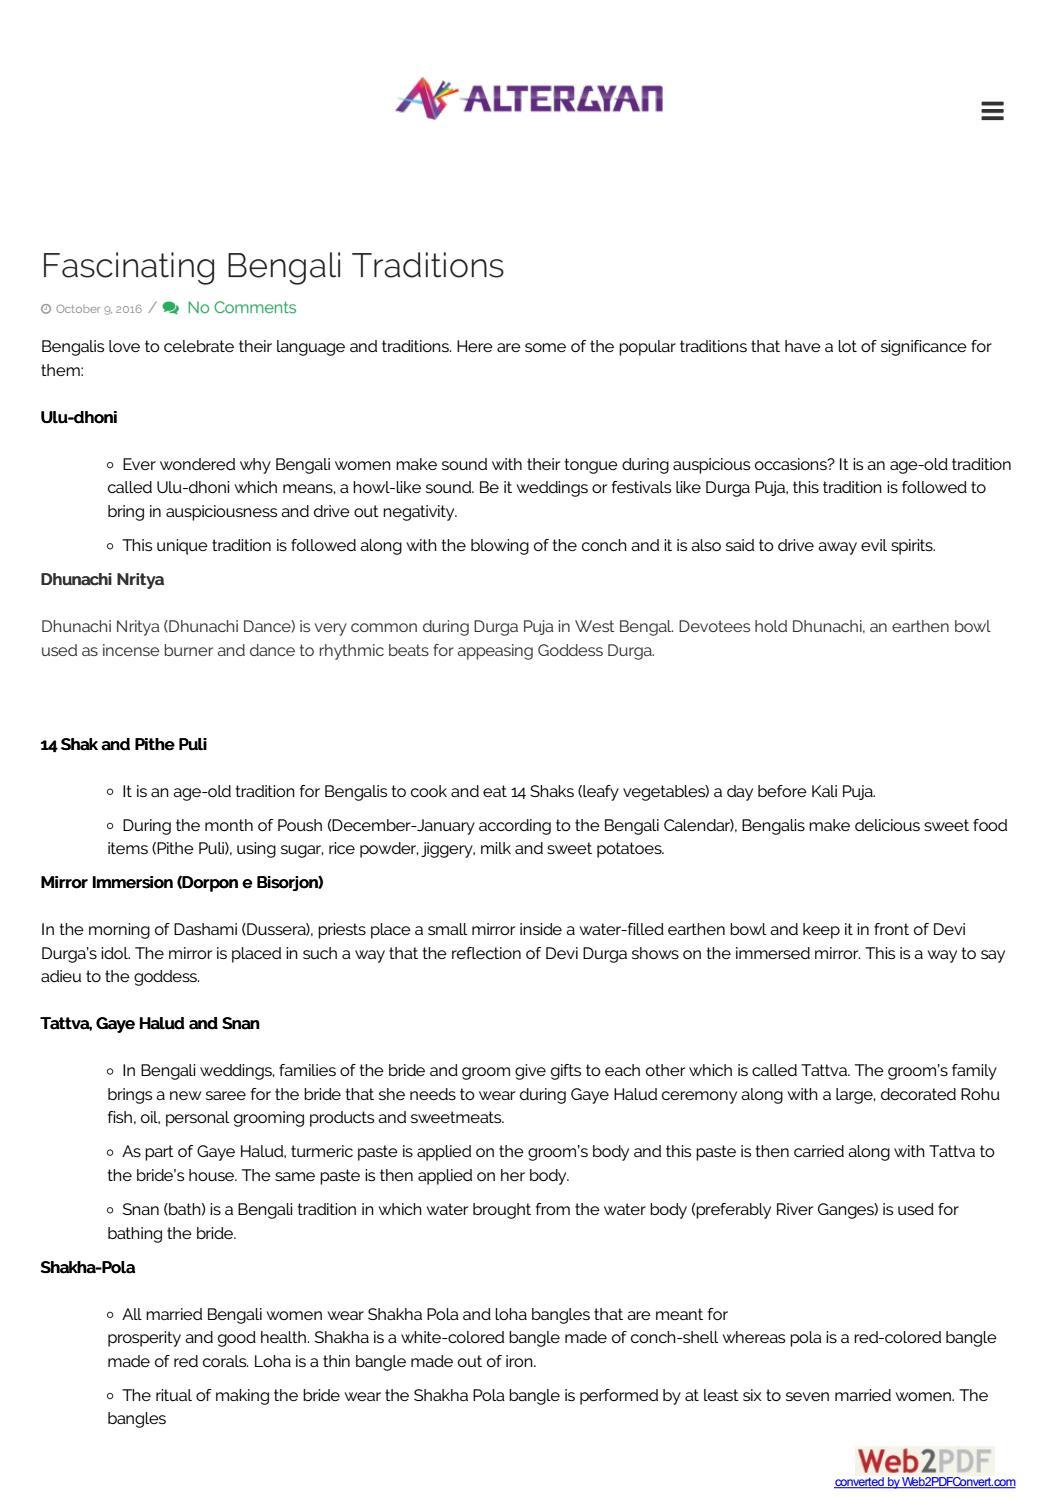 Fascinating bengali traditions